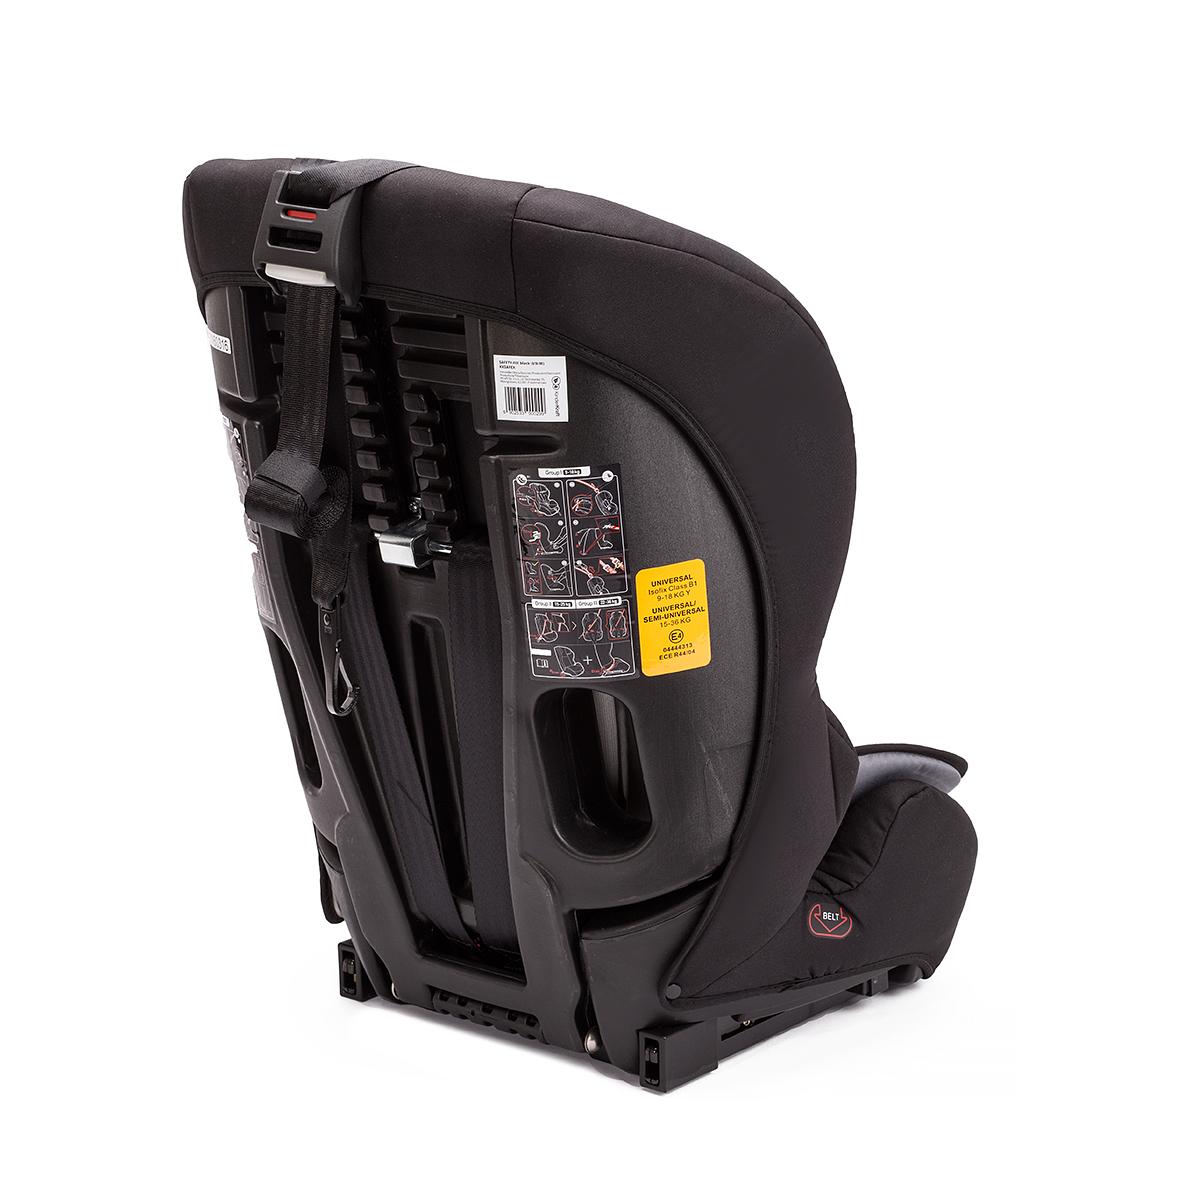 Kinderkraft Safety Fix Car Seat Reviews